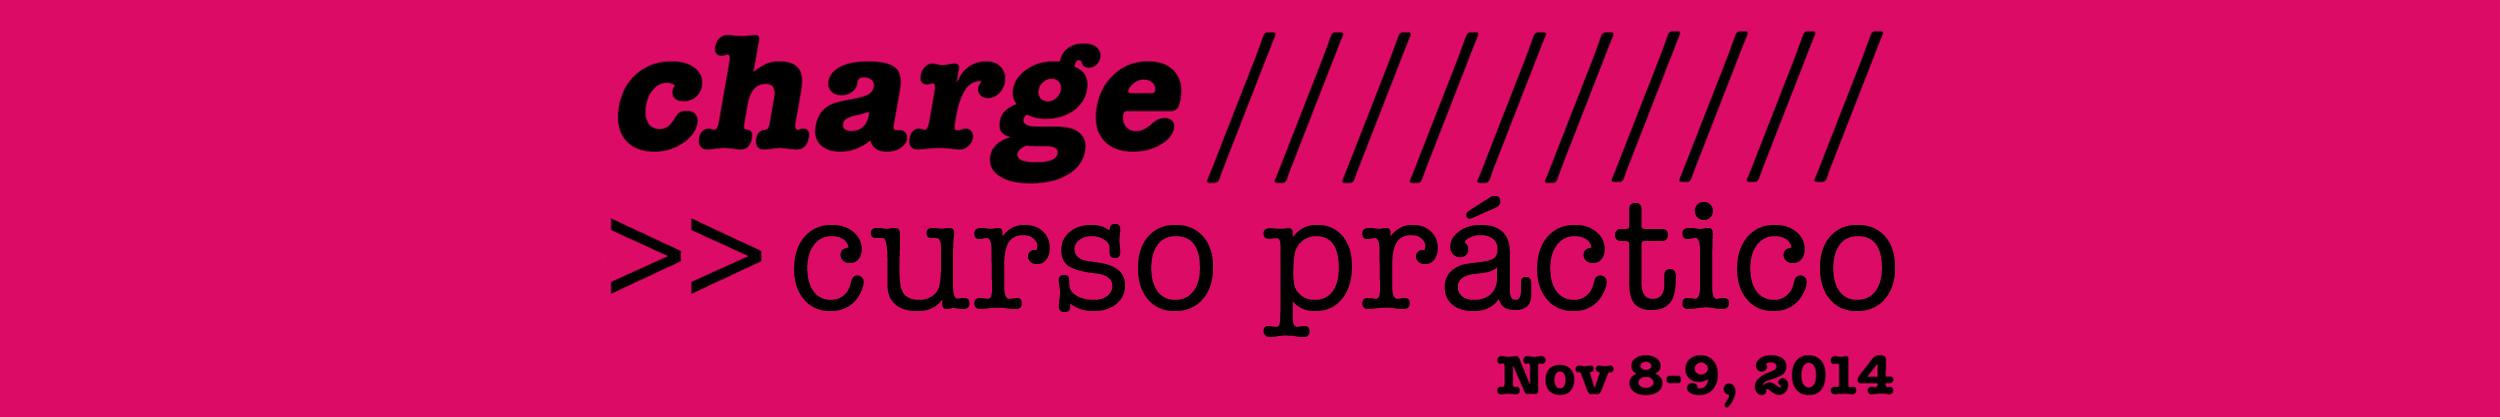 charge-practicum-title-web-wide-spanish.jpg